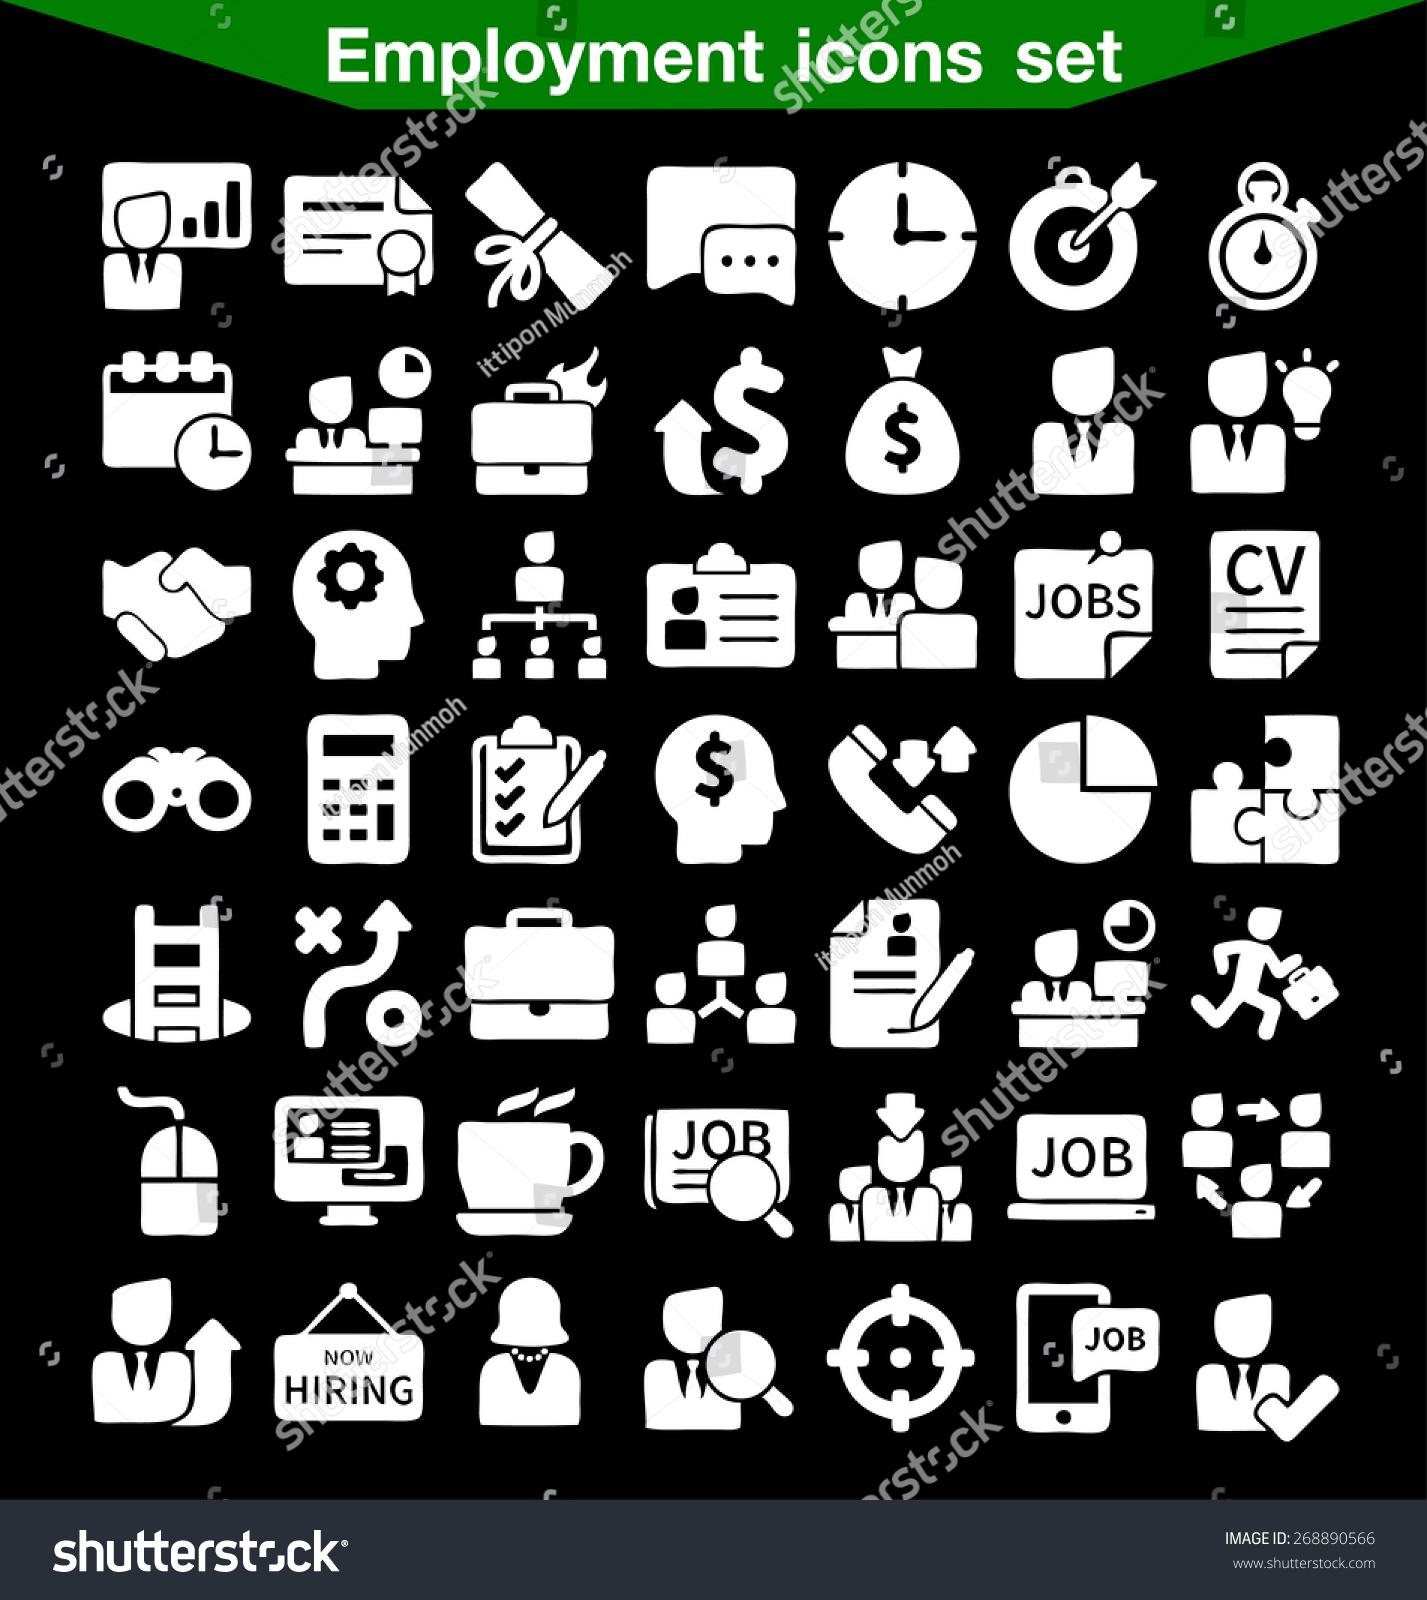 Job Icon Set download free for windows 10 64bit - truebfil